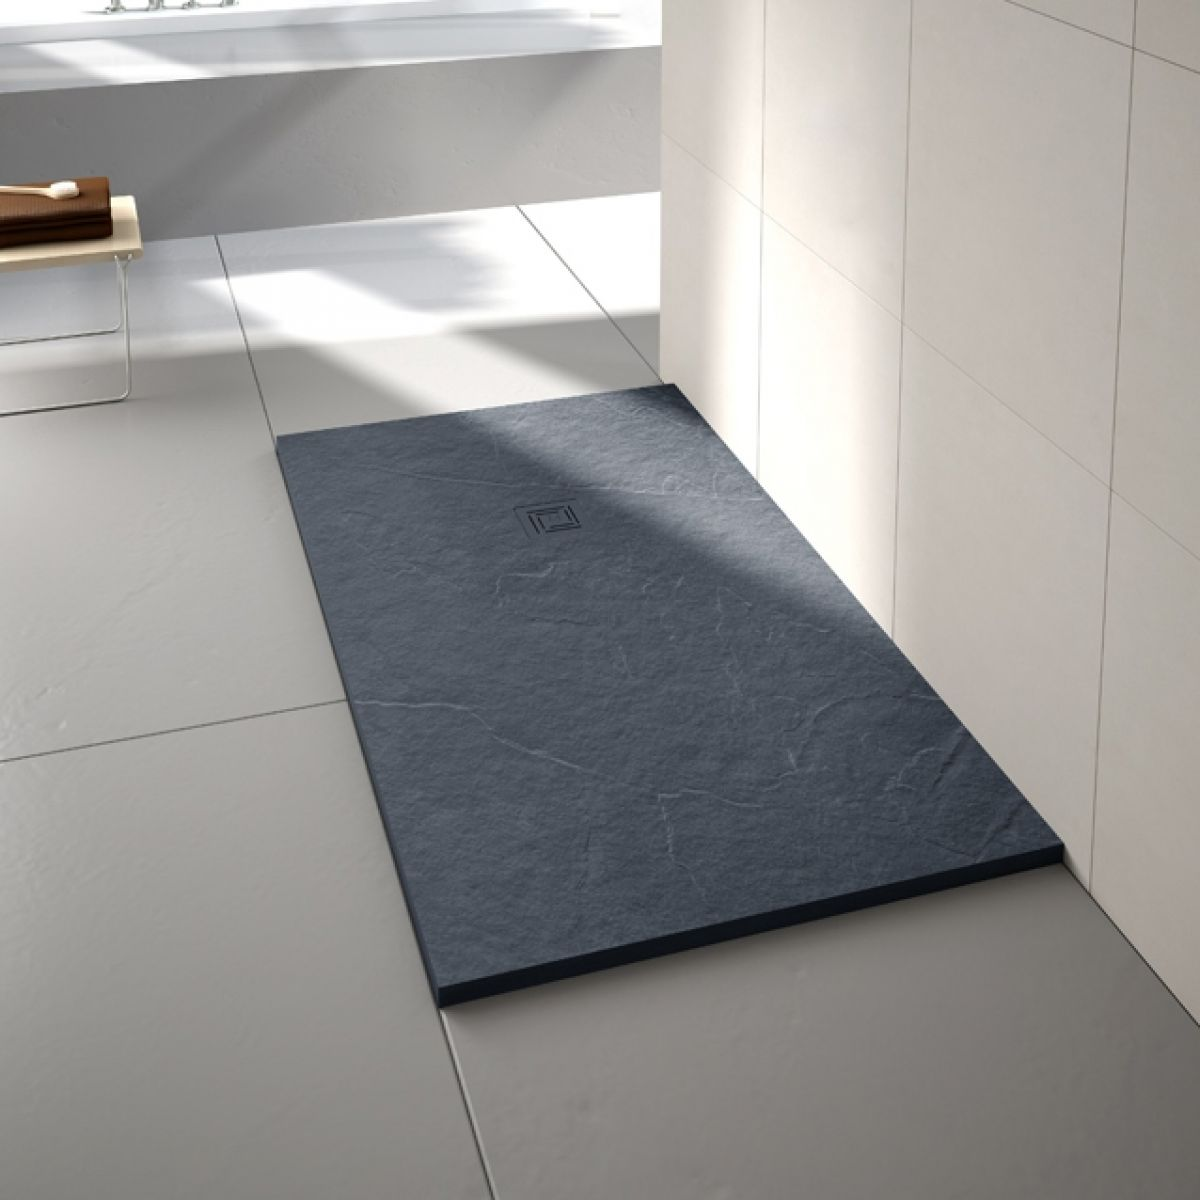 Merlyn Truestone Slate Black Rectangular Shower Tray 1500 x 800mm